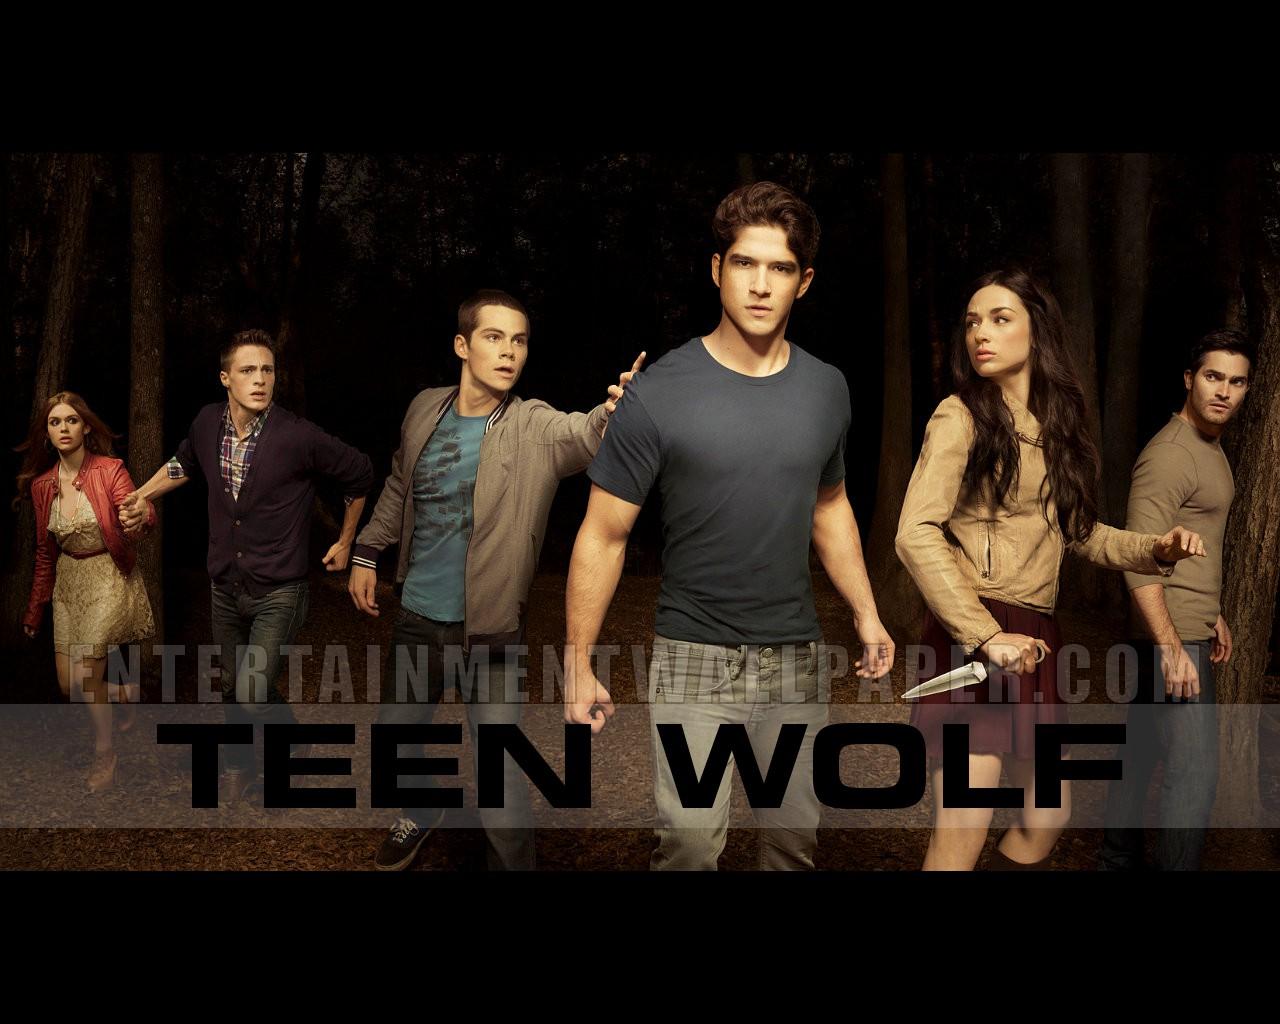 Teen Wolf teen wolf